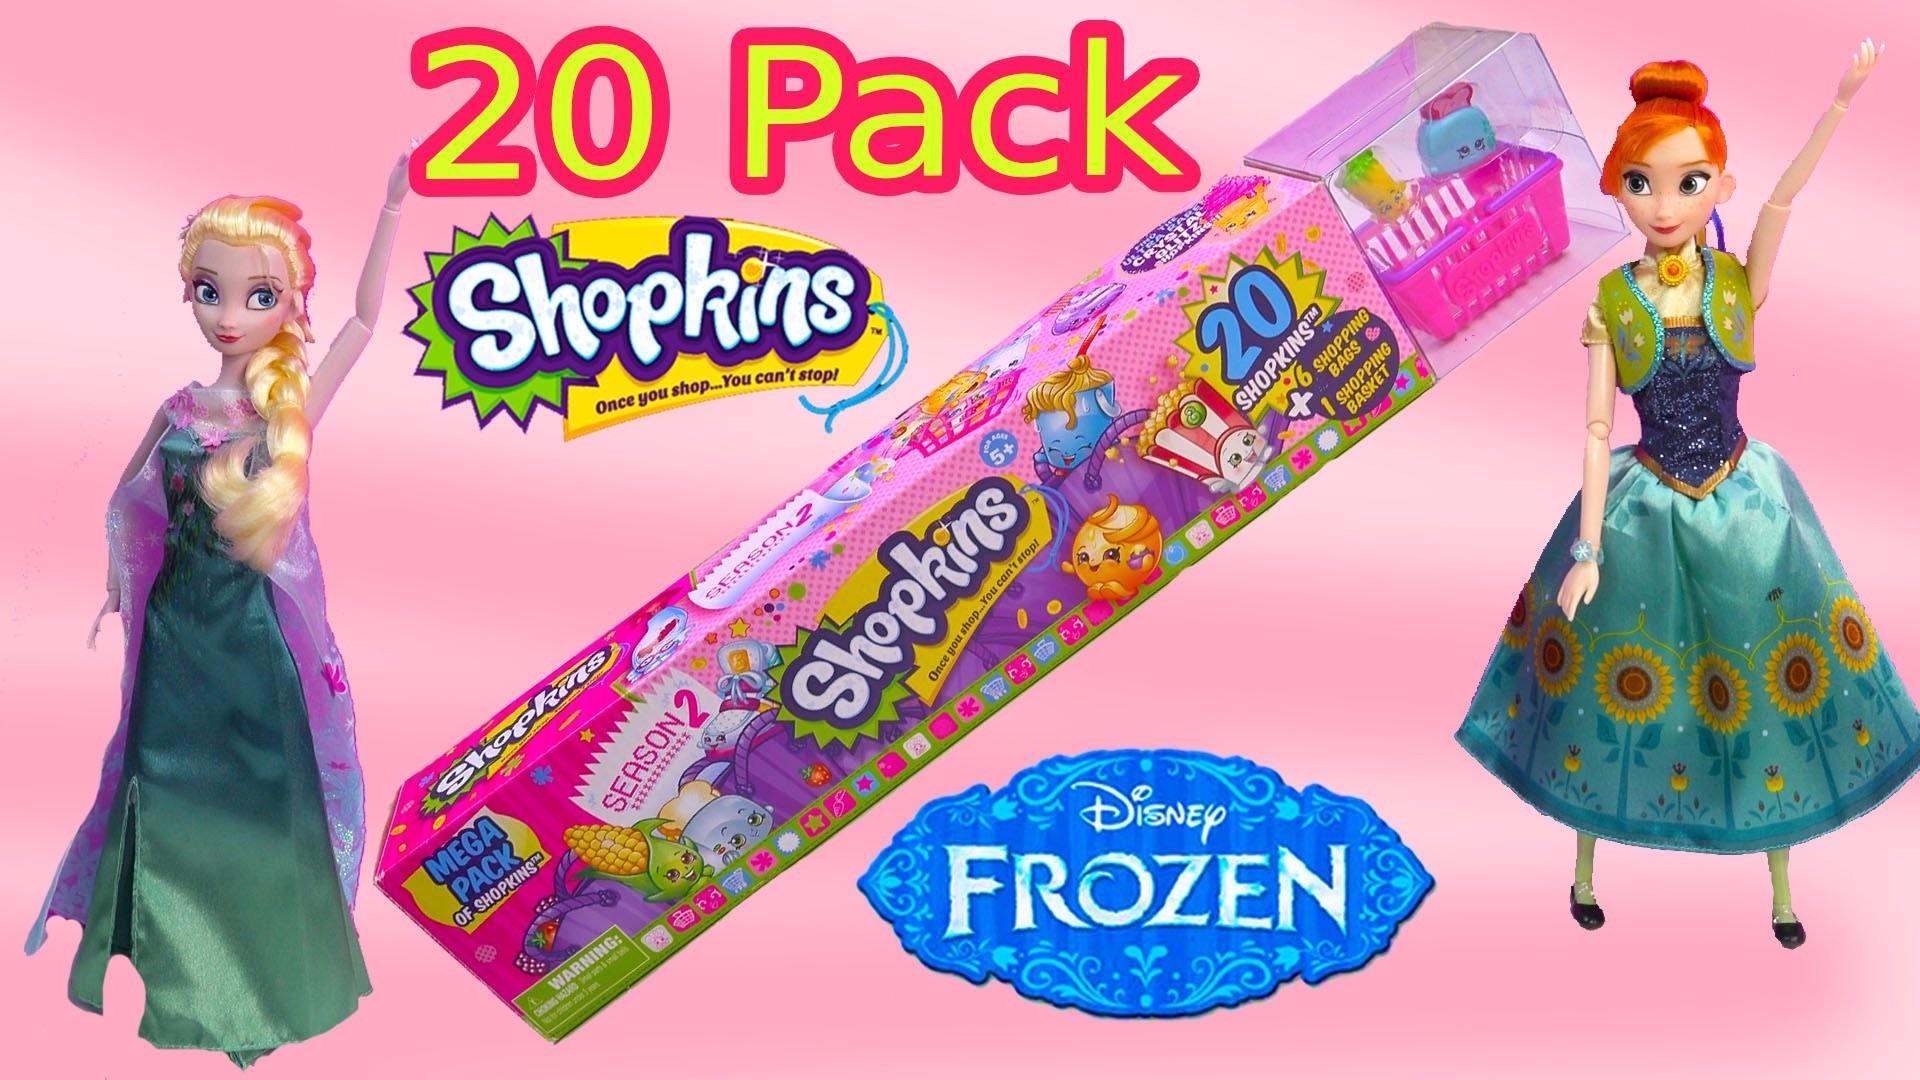 Queen Elsa Shopkins 20 Mega Pack Season 2 Disney Frozen Fever Princess Anna Dolls Toy Blind Bags